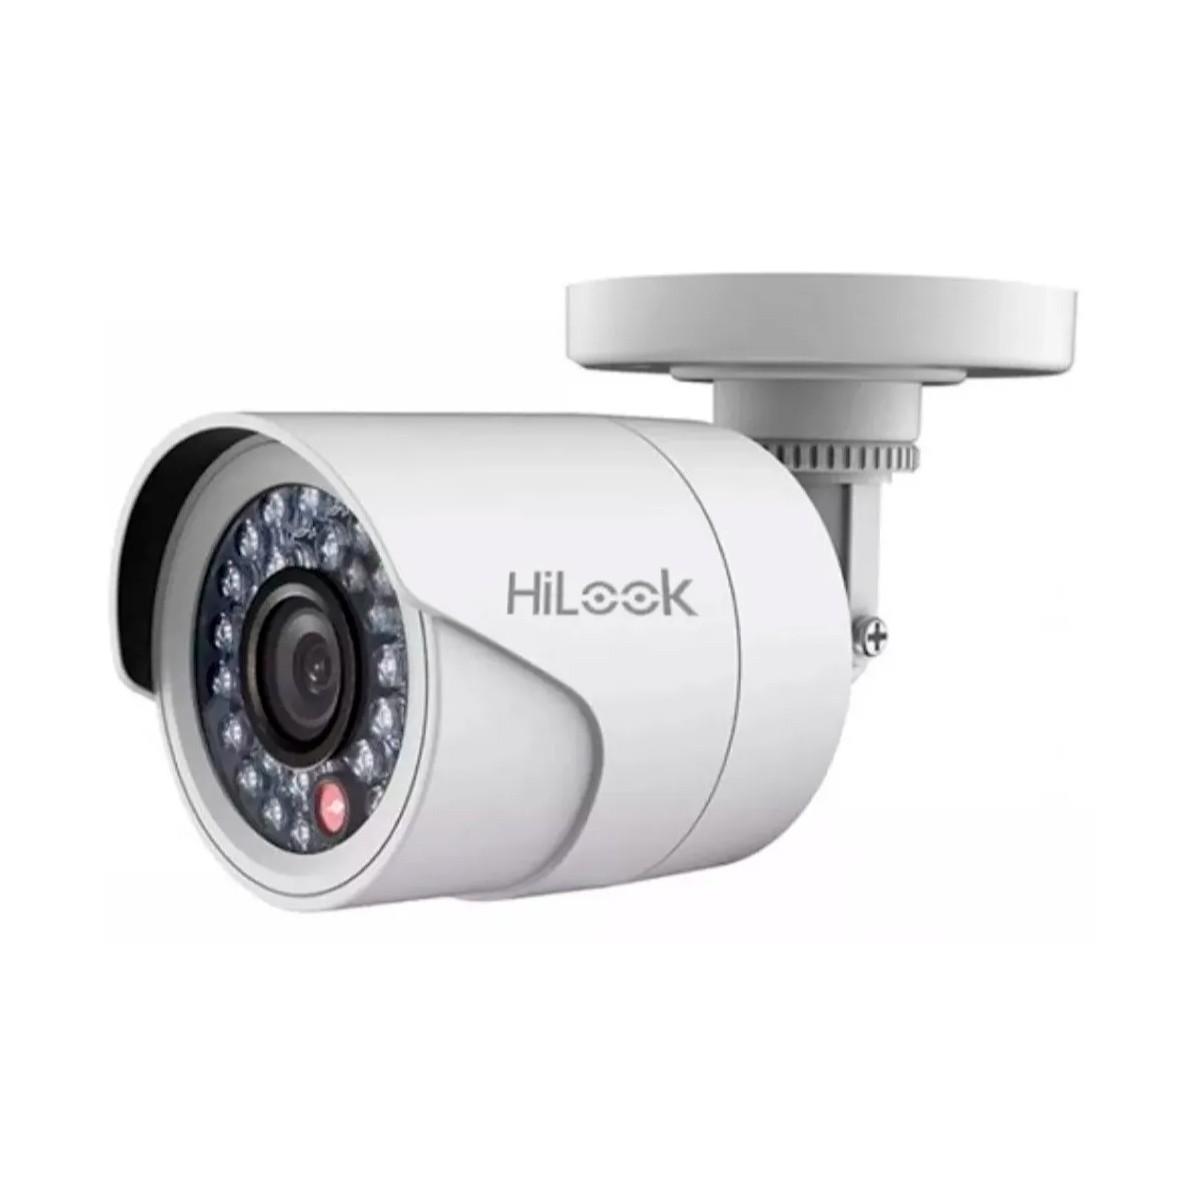 Câmera Hilook Hikvision 1mp 720p 4x1 2,8mm Thc-b110c-p  - GO AUTOMAÇÃO